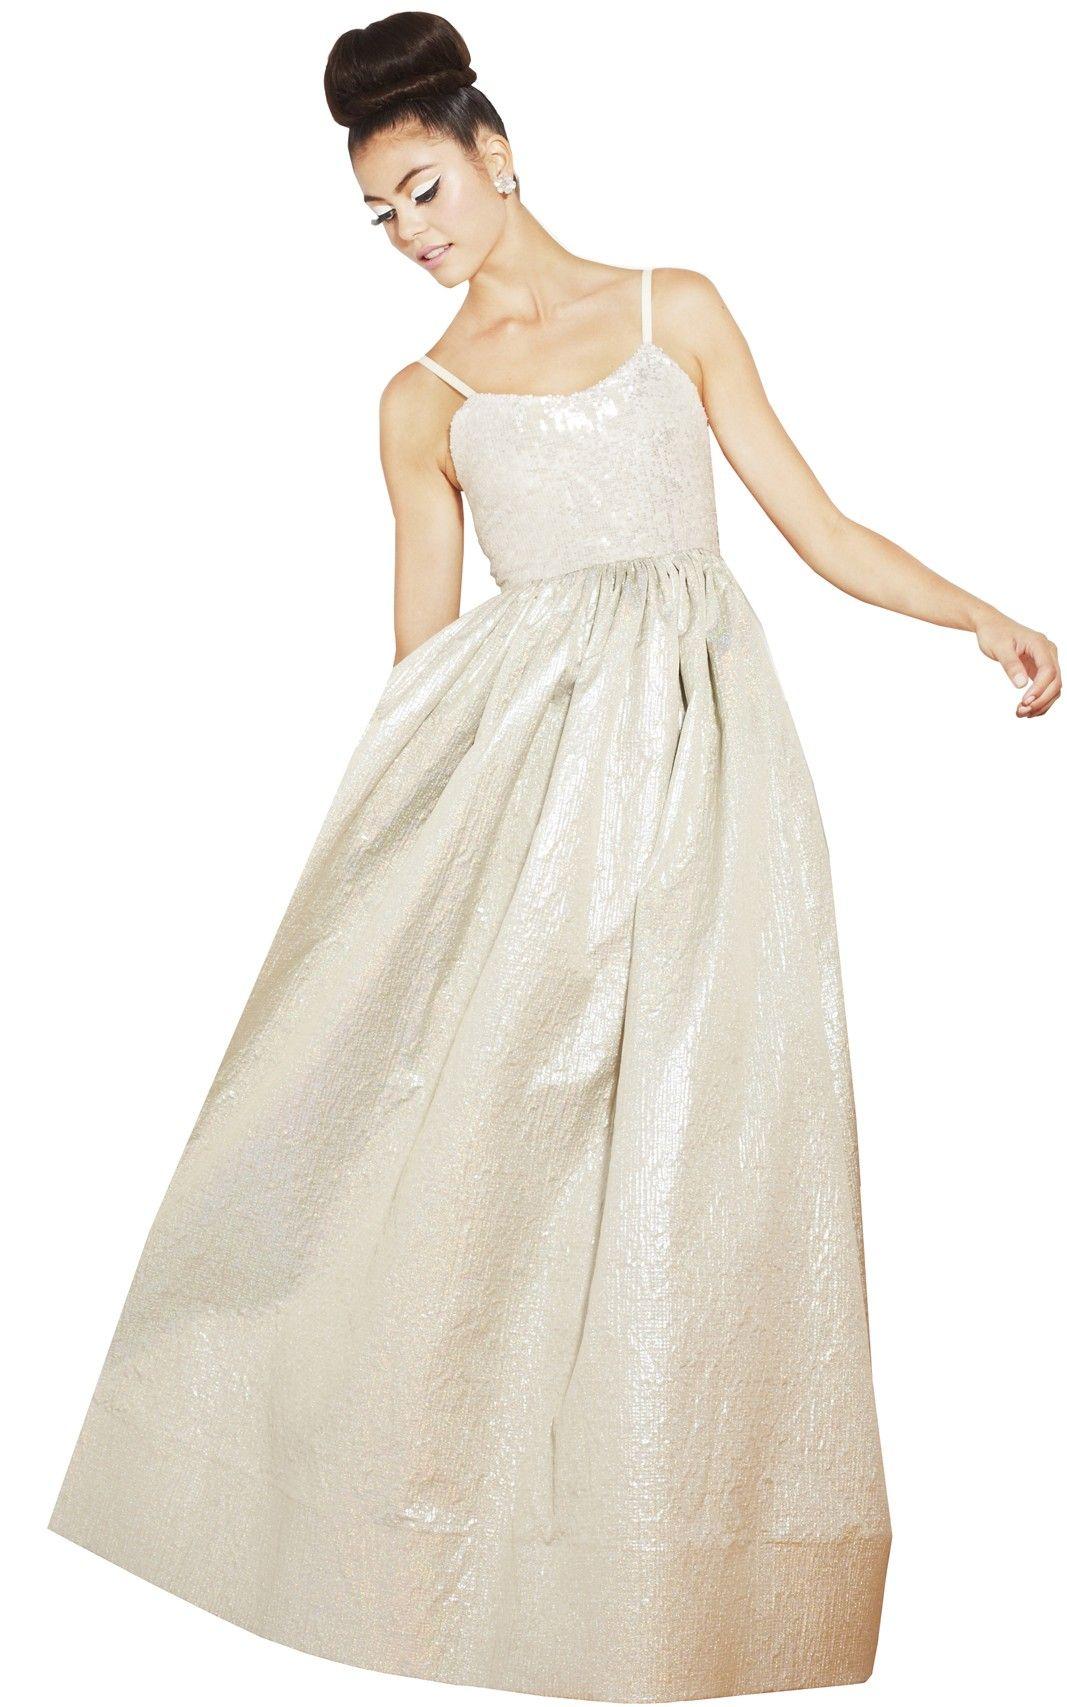 Alice & Olivia Annette gown | Fancy Dress Obsession | Pinterest ...